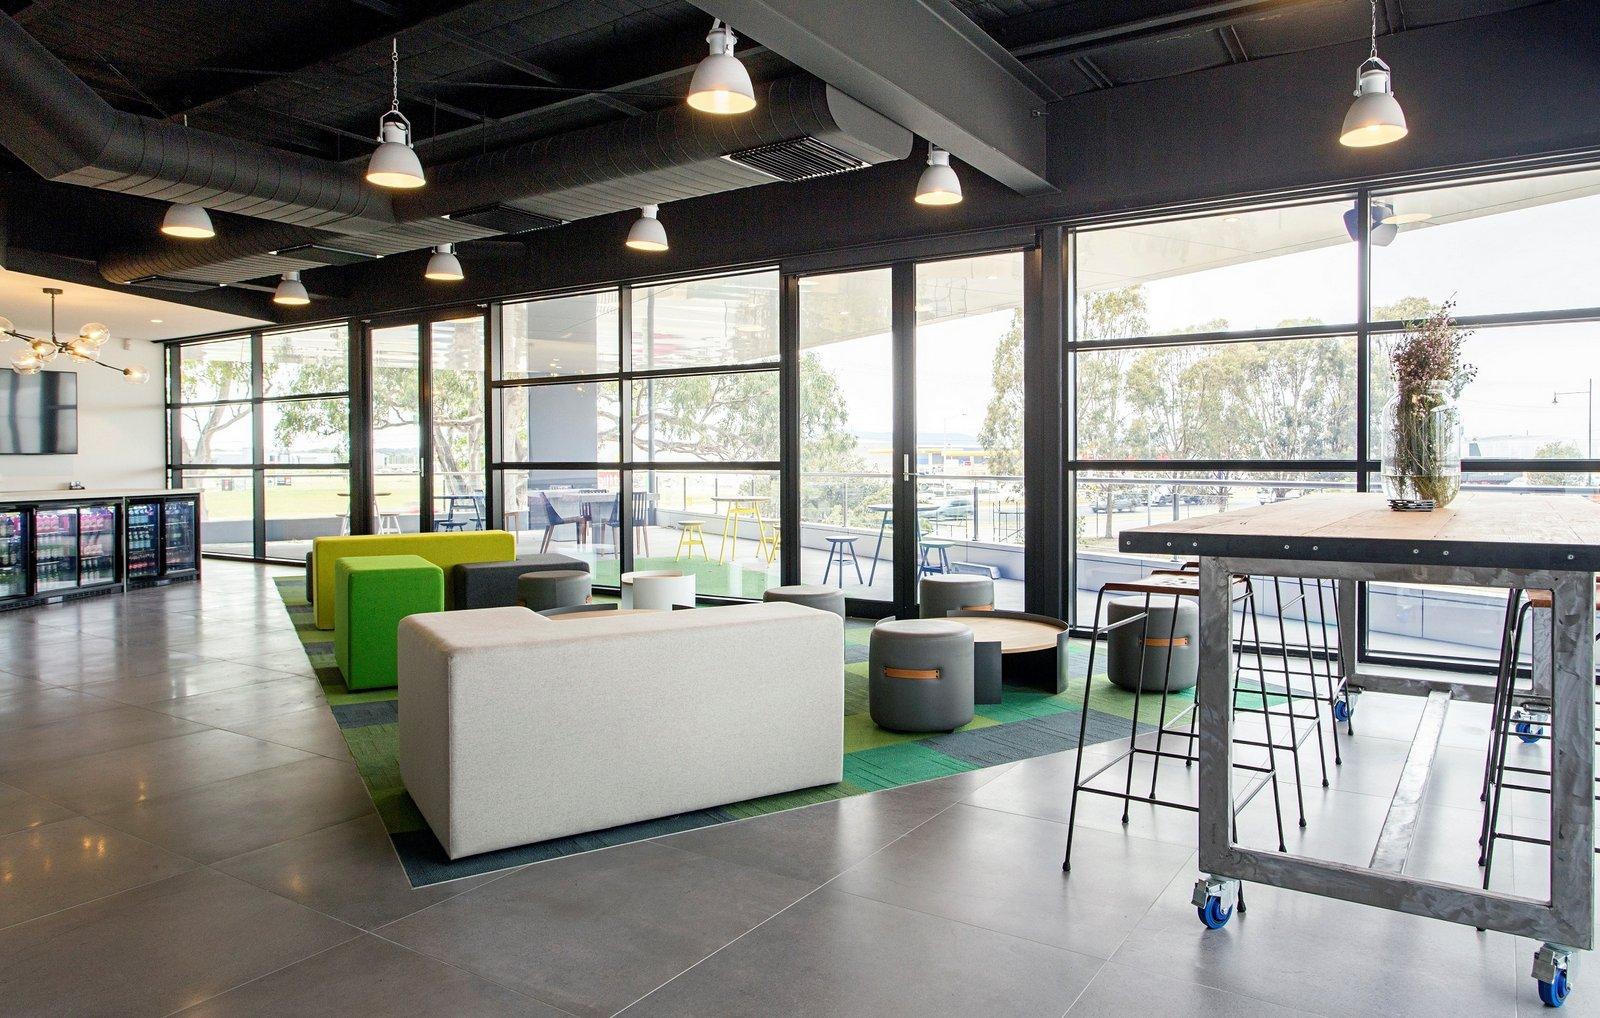 Pleasing 21 Office Ceiling Designs Decorating Ideas Design Trends Largest Home Design Picture Inspirations Pitcheantrous